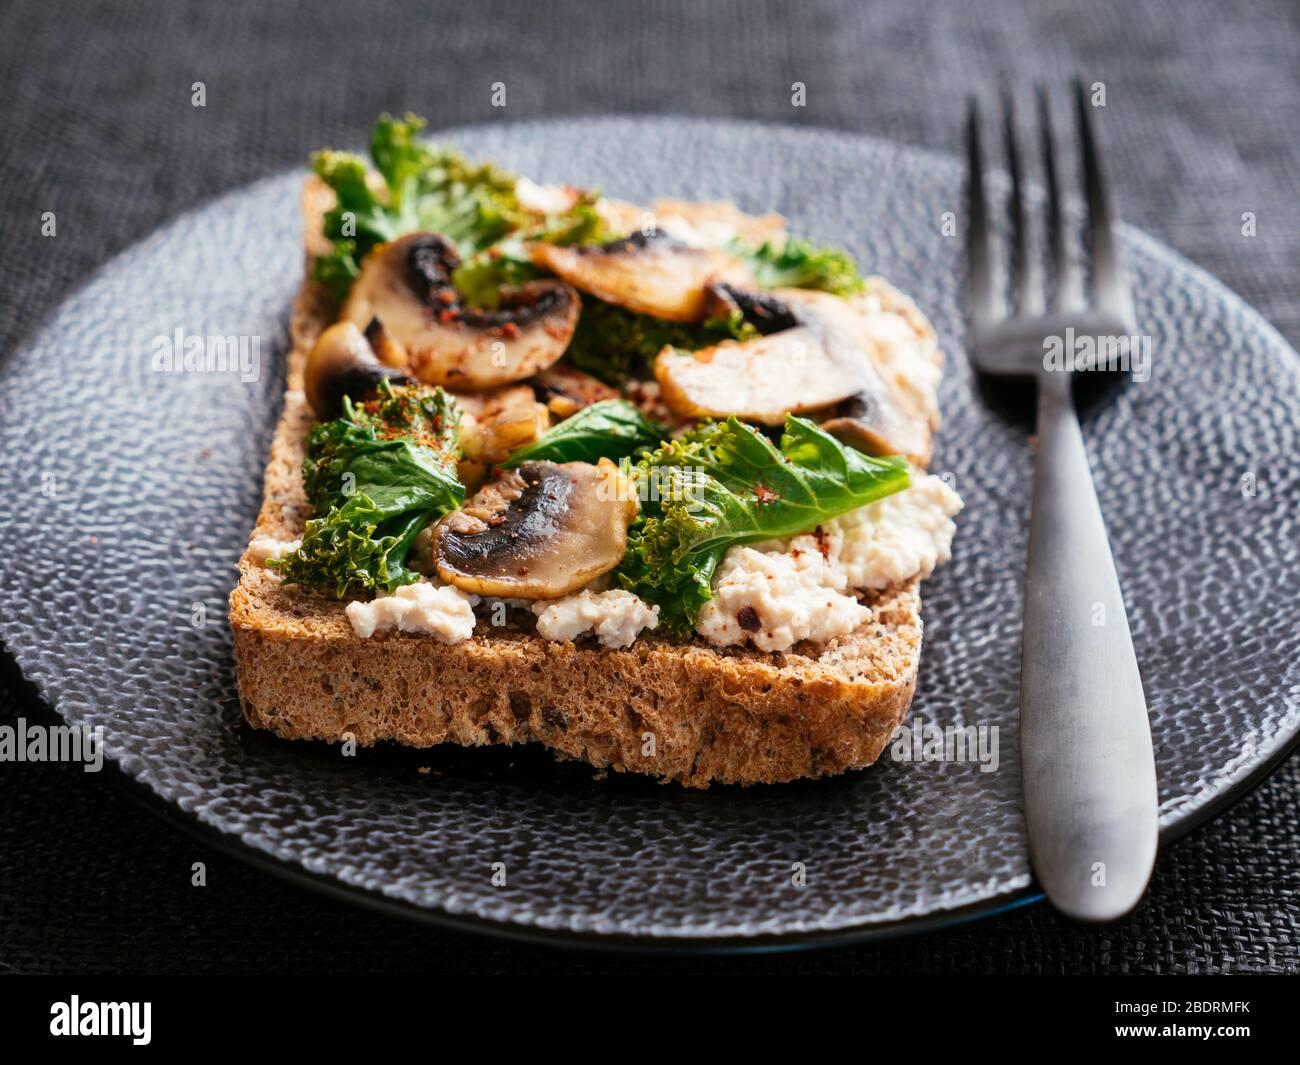 11+ Vegan Ricotta, Mushrooms and Kale on Toast Stock Photo   Alamy Stock